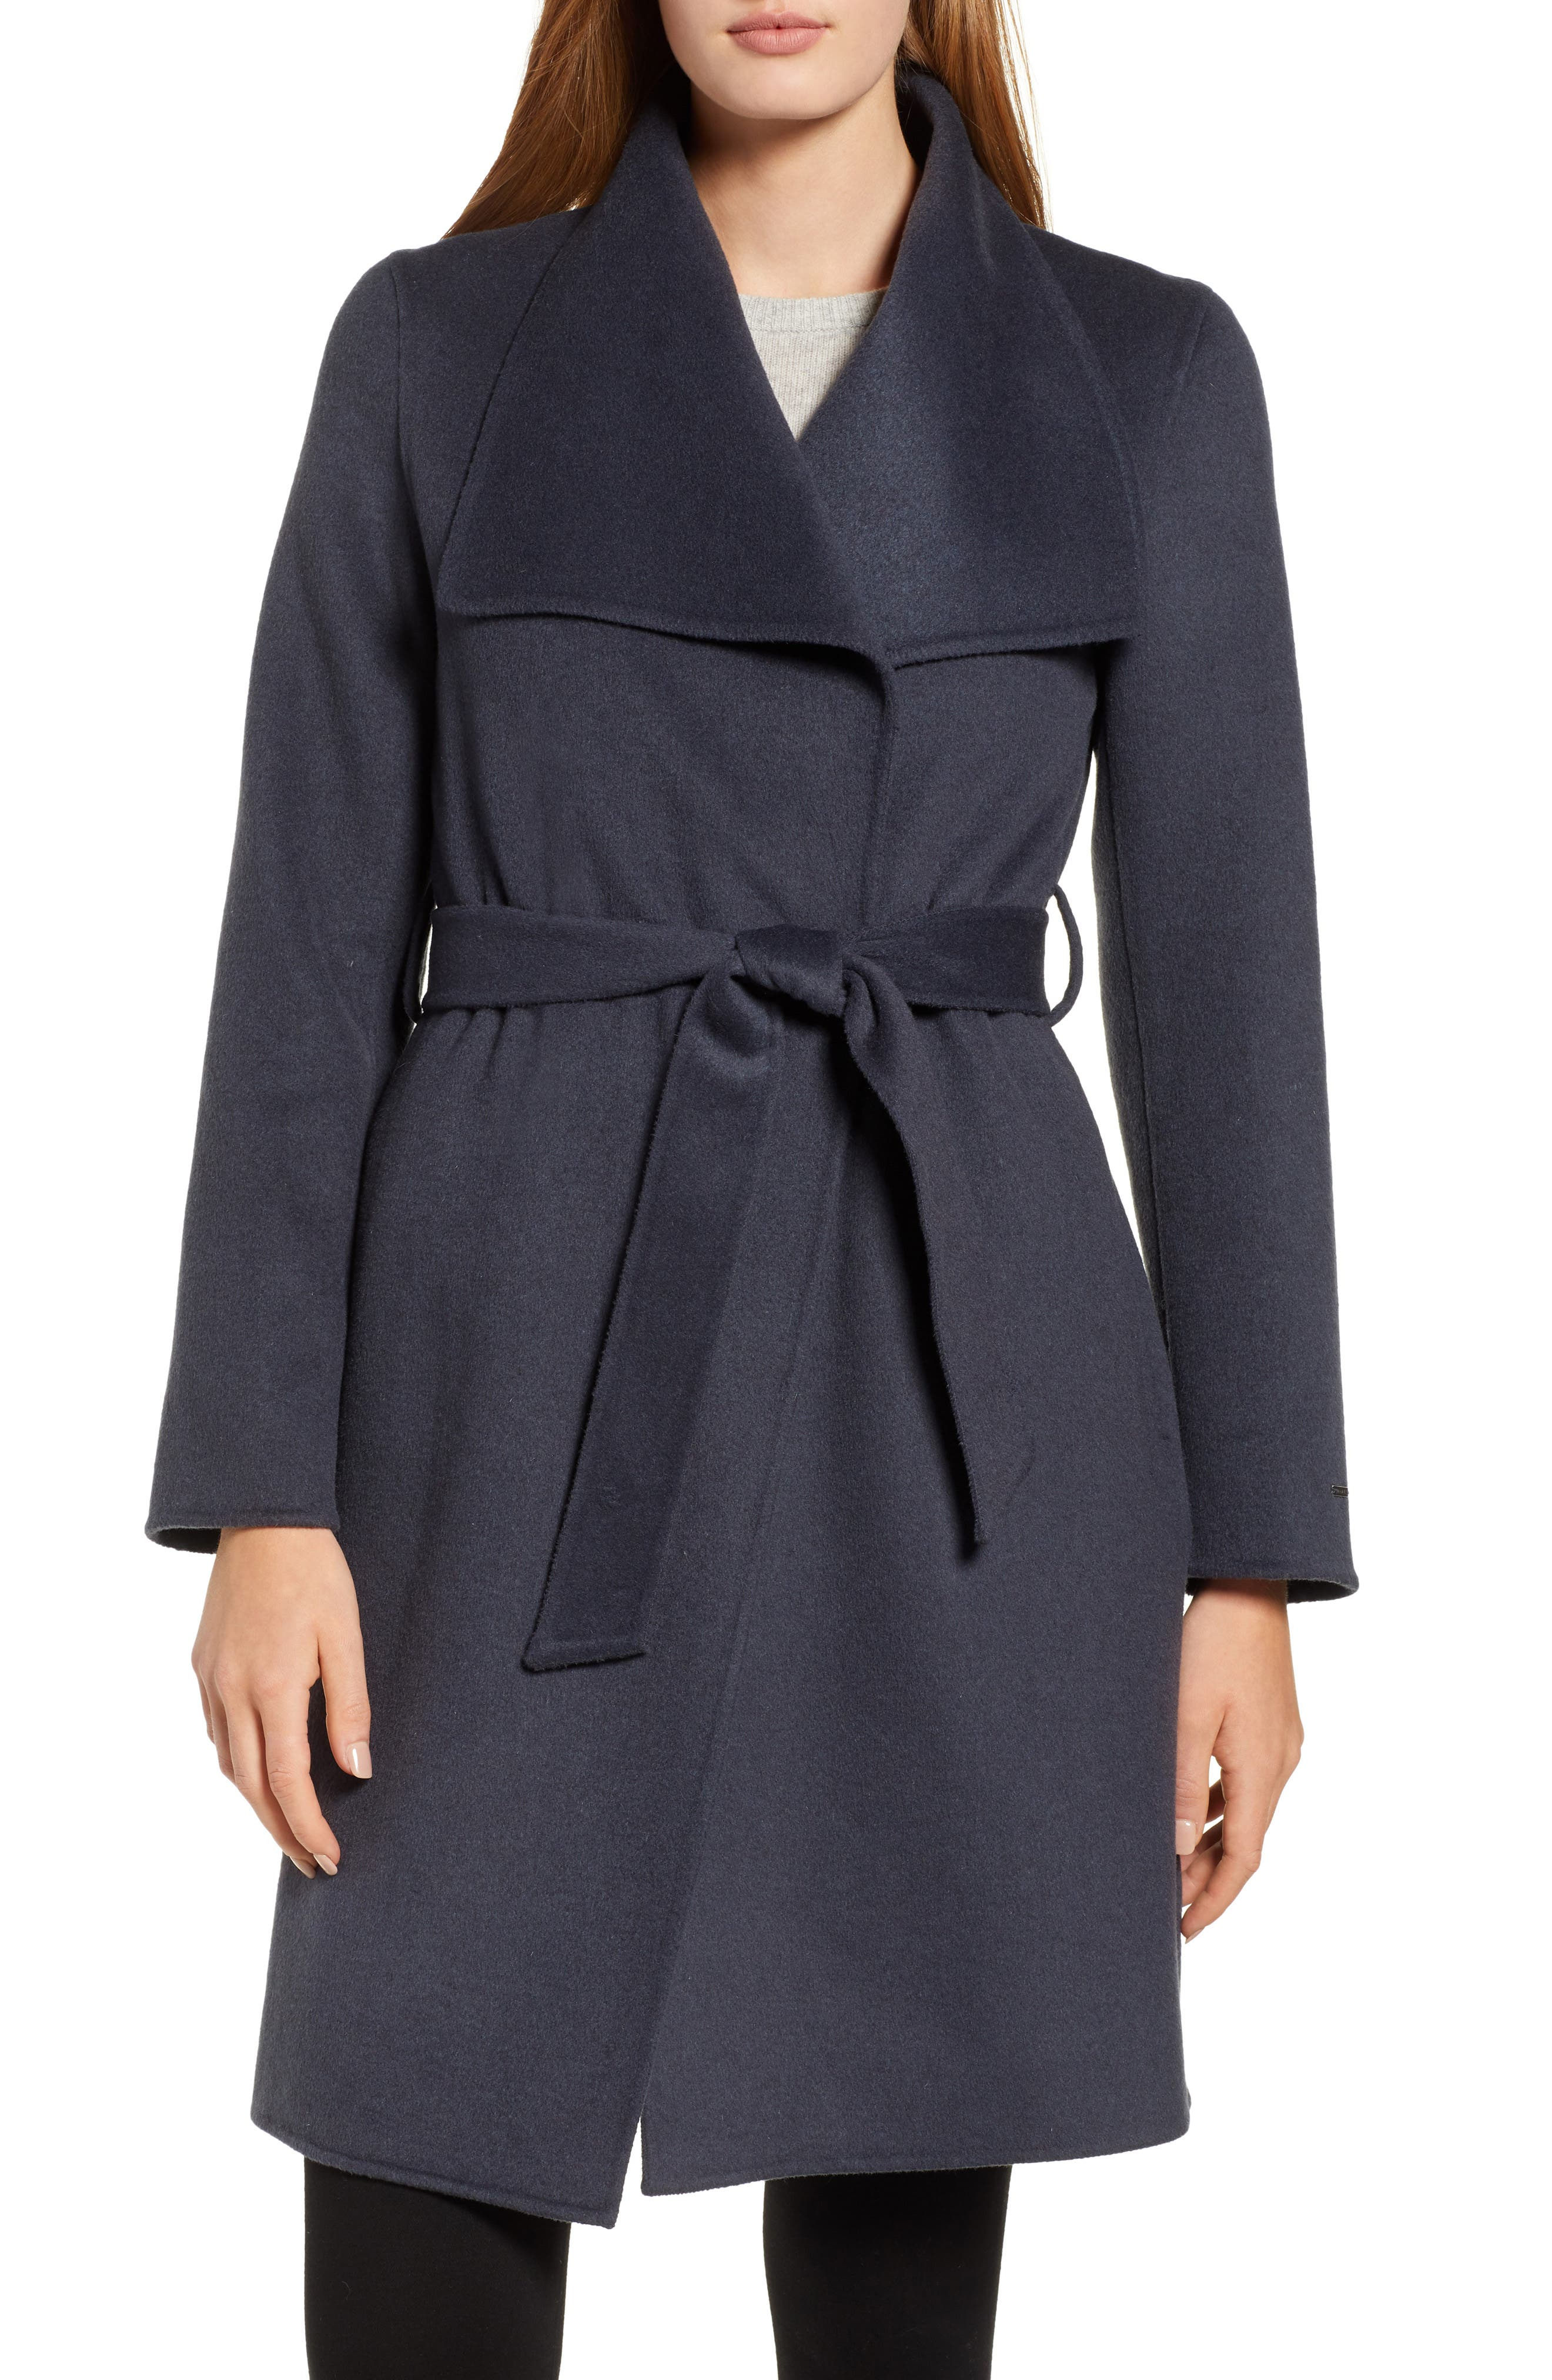 Tahari Ellie Double Face Wool Blend Wrap Coat $268 (Nordstrom)